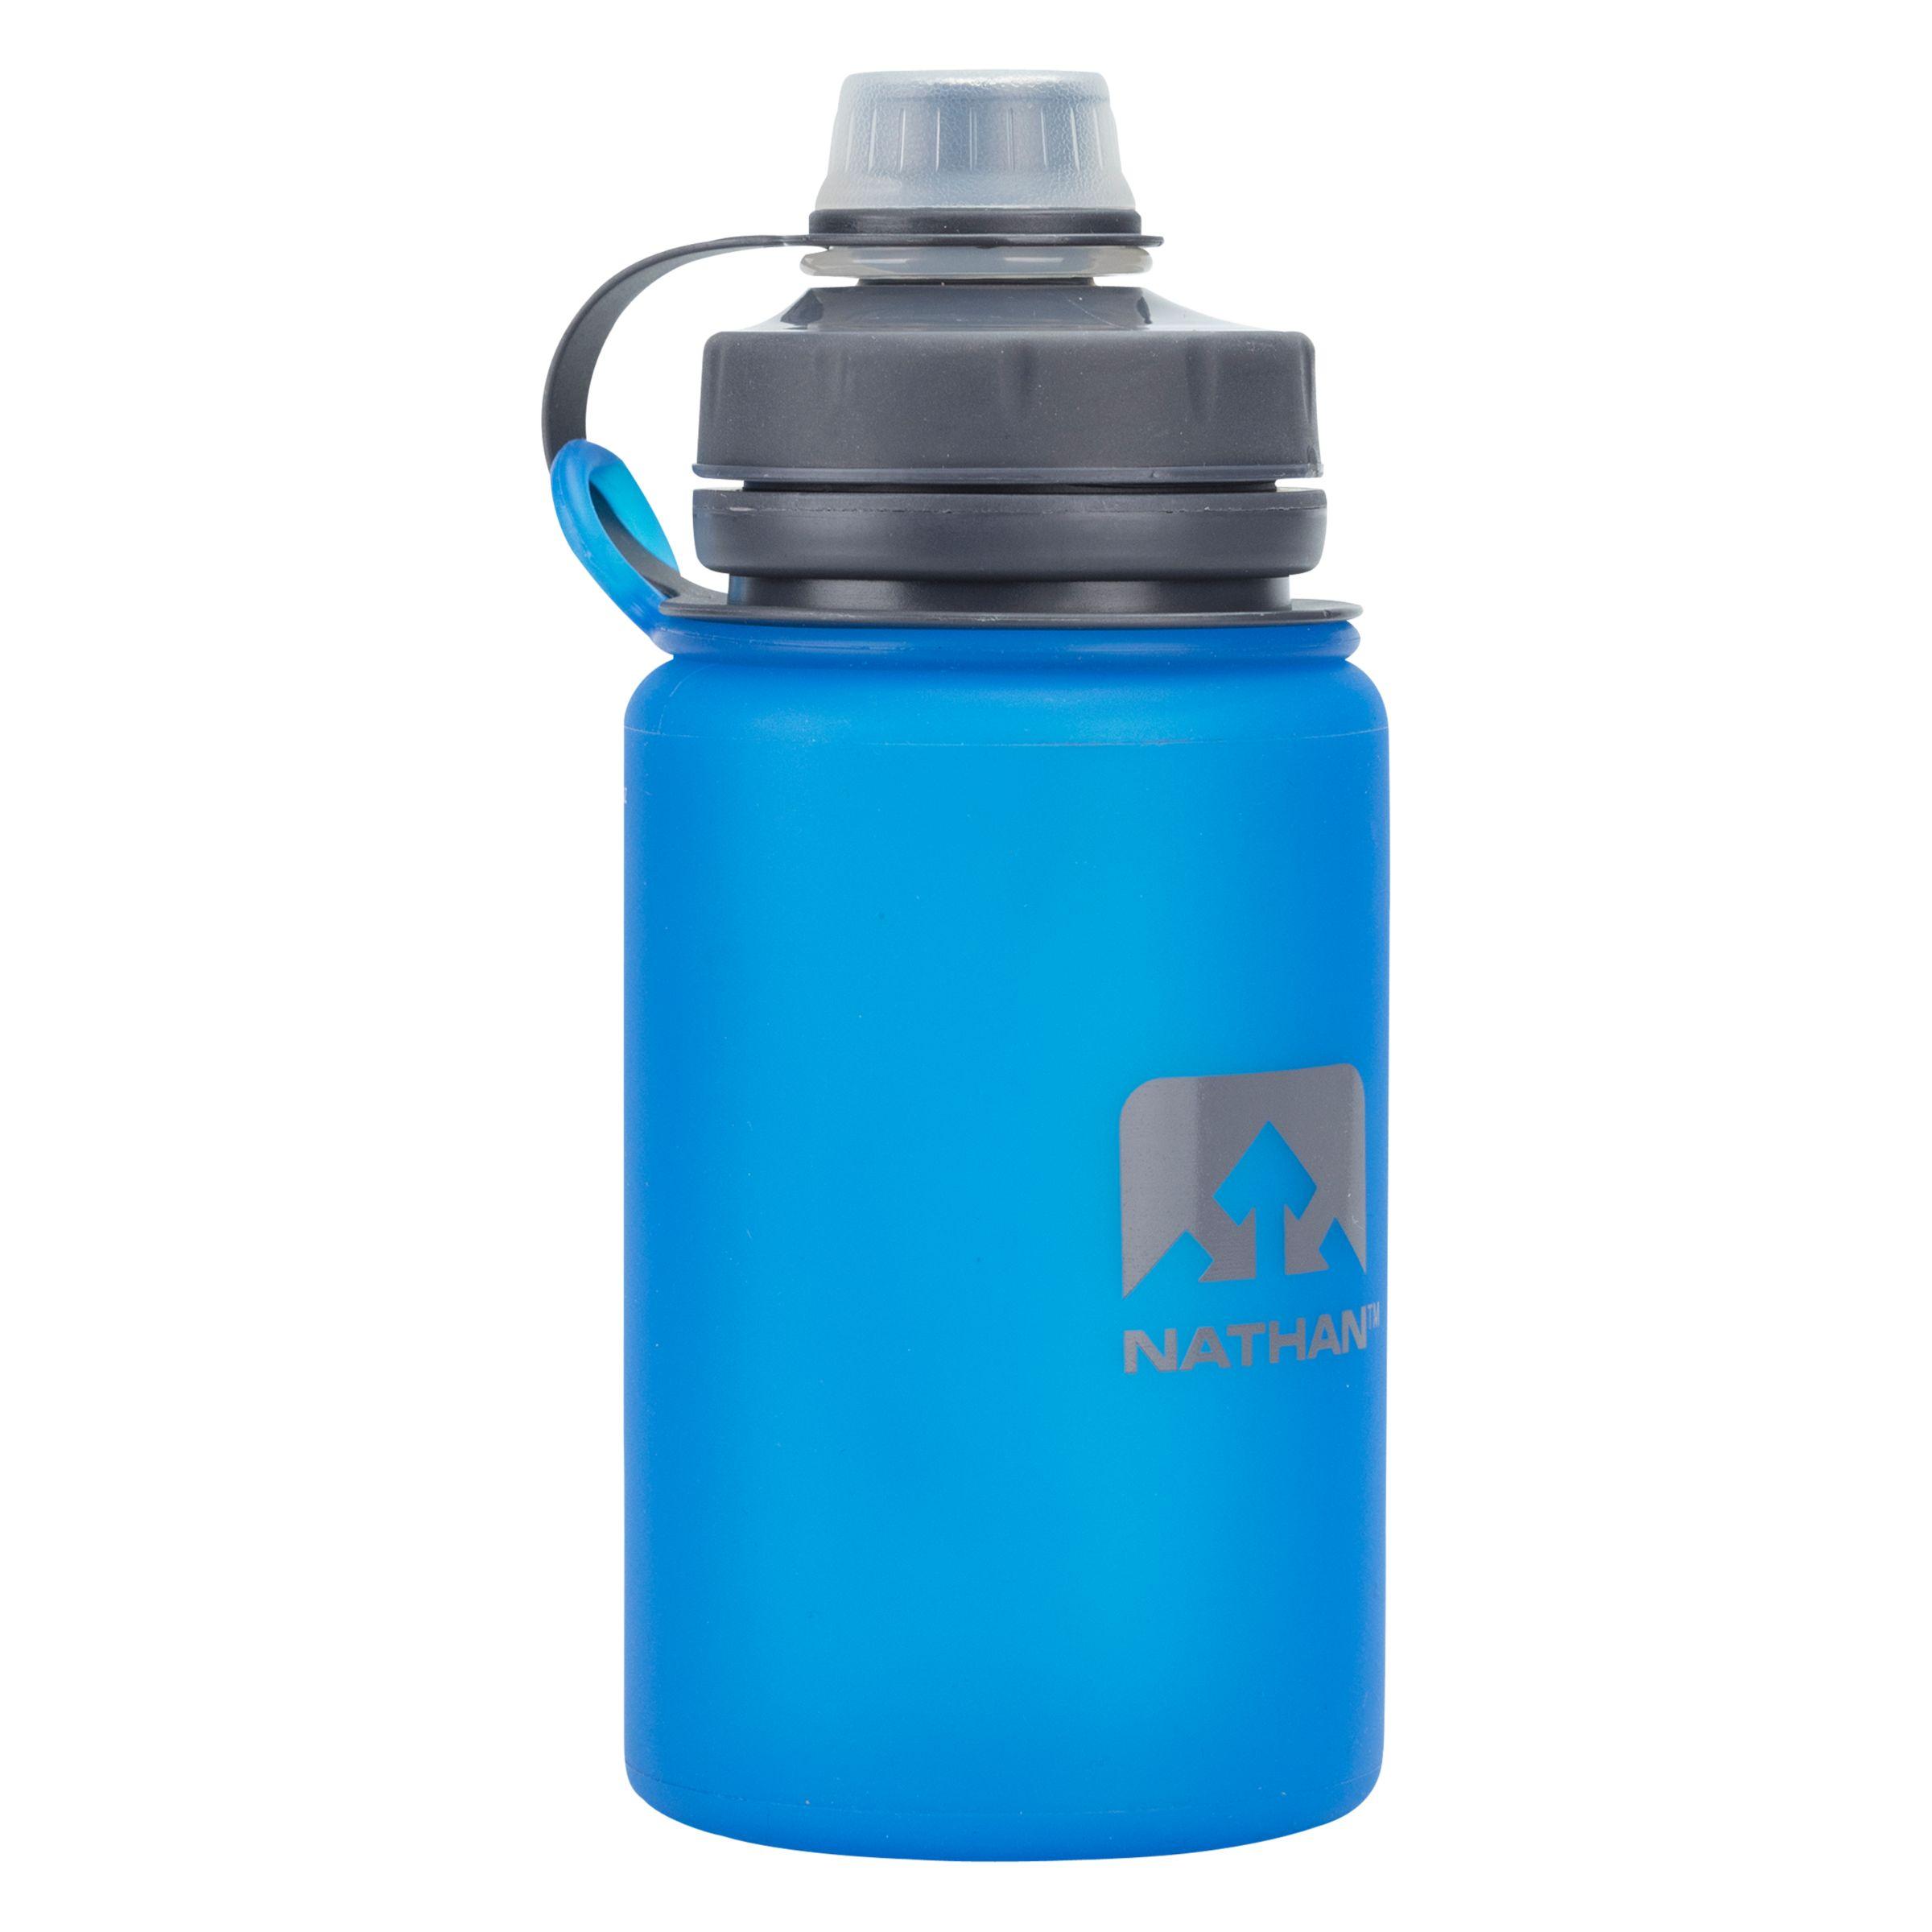 Nathan Nathan FlexShot Soft Water Bottle, 750ml